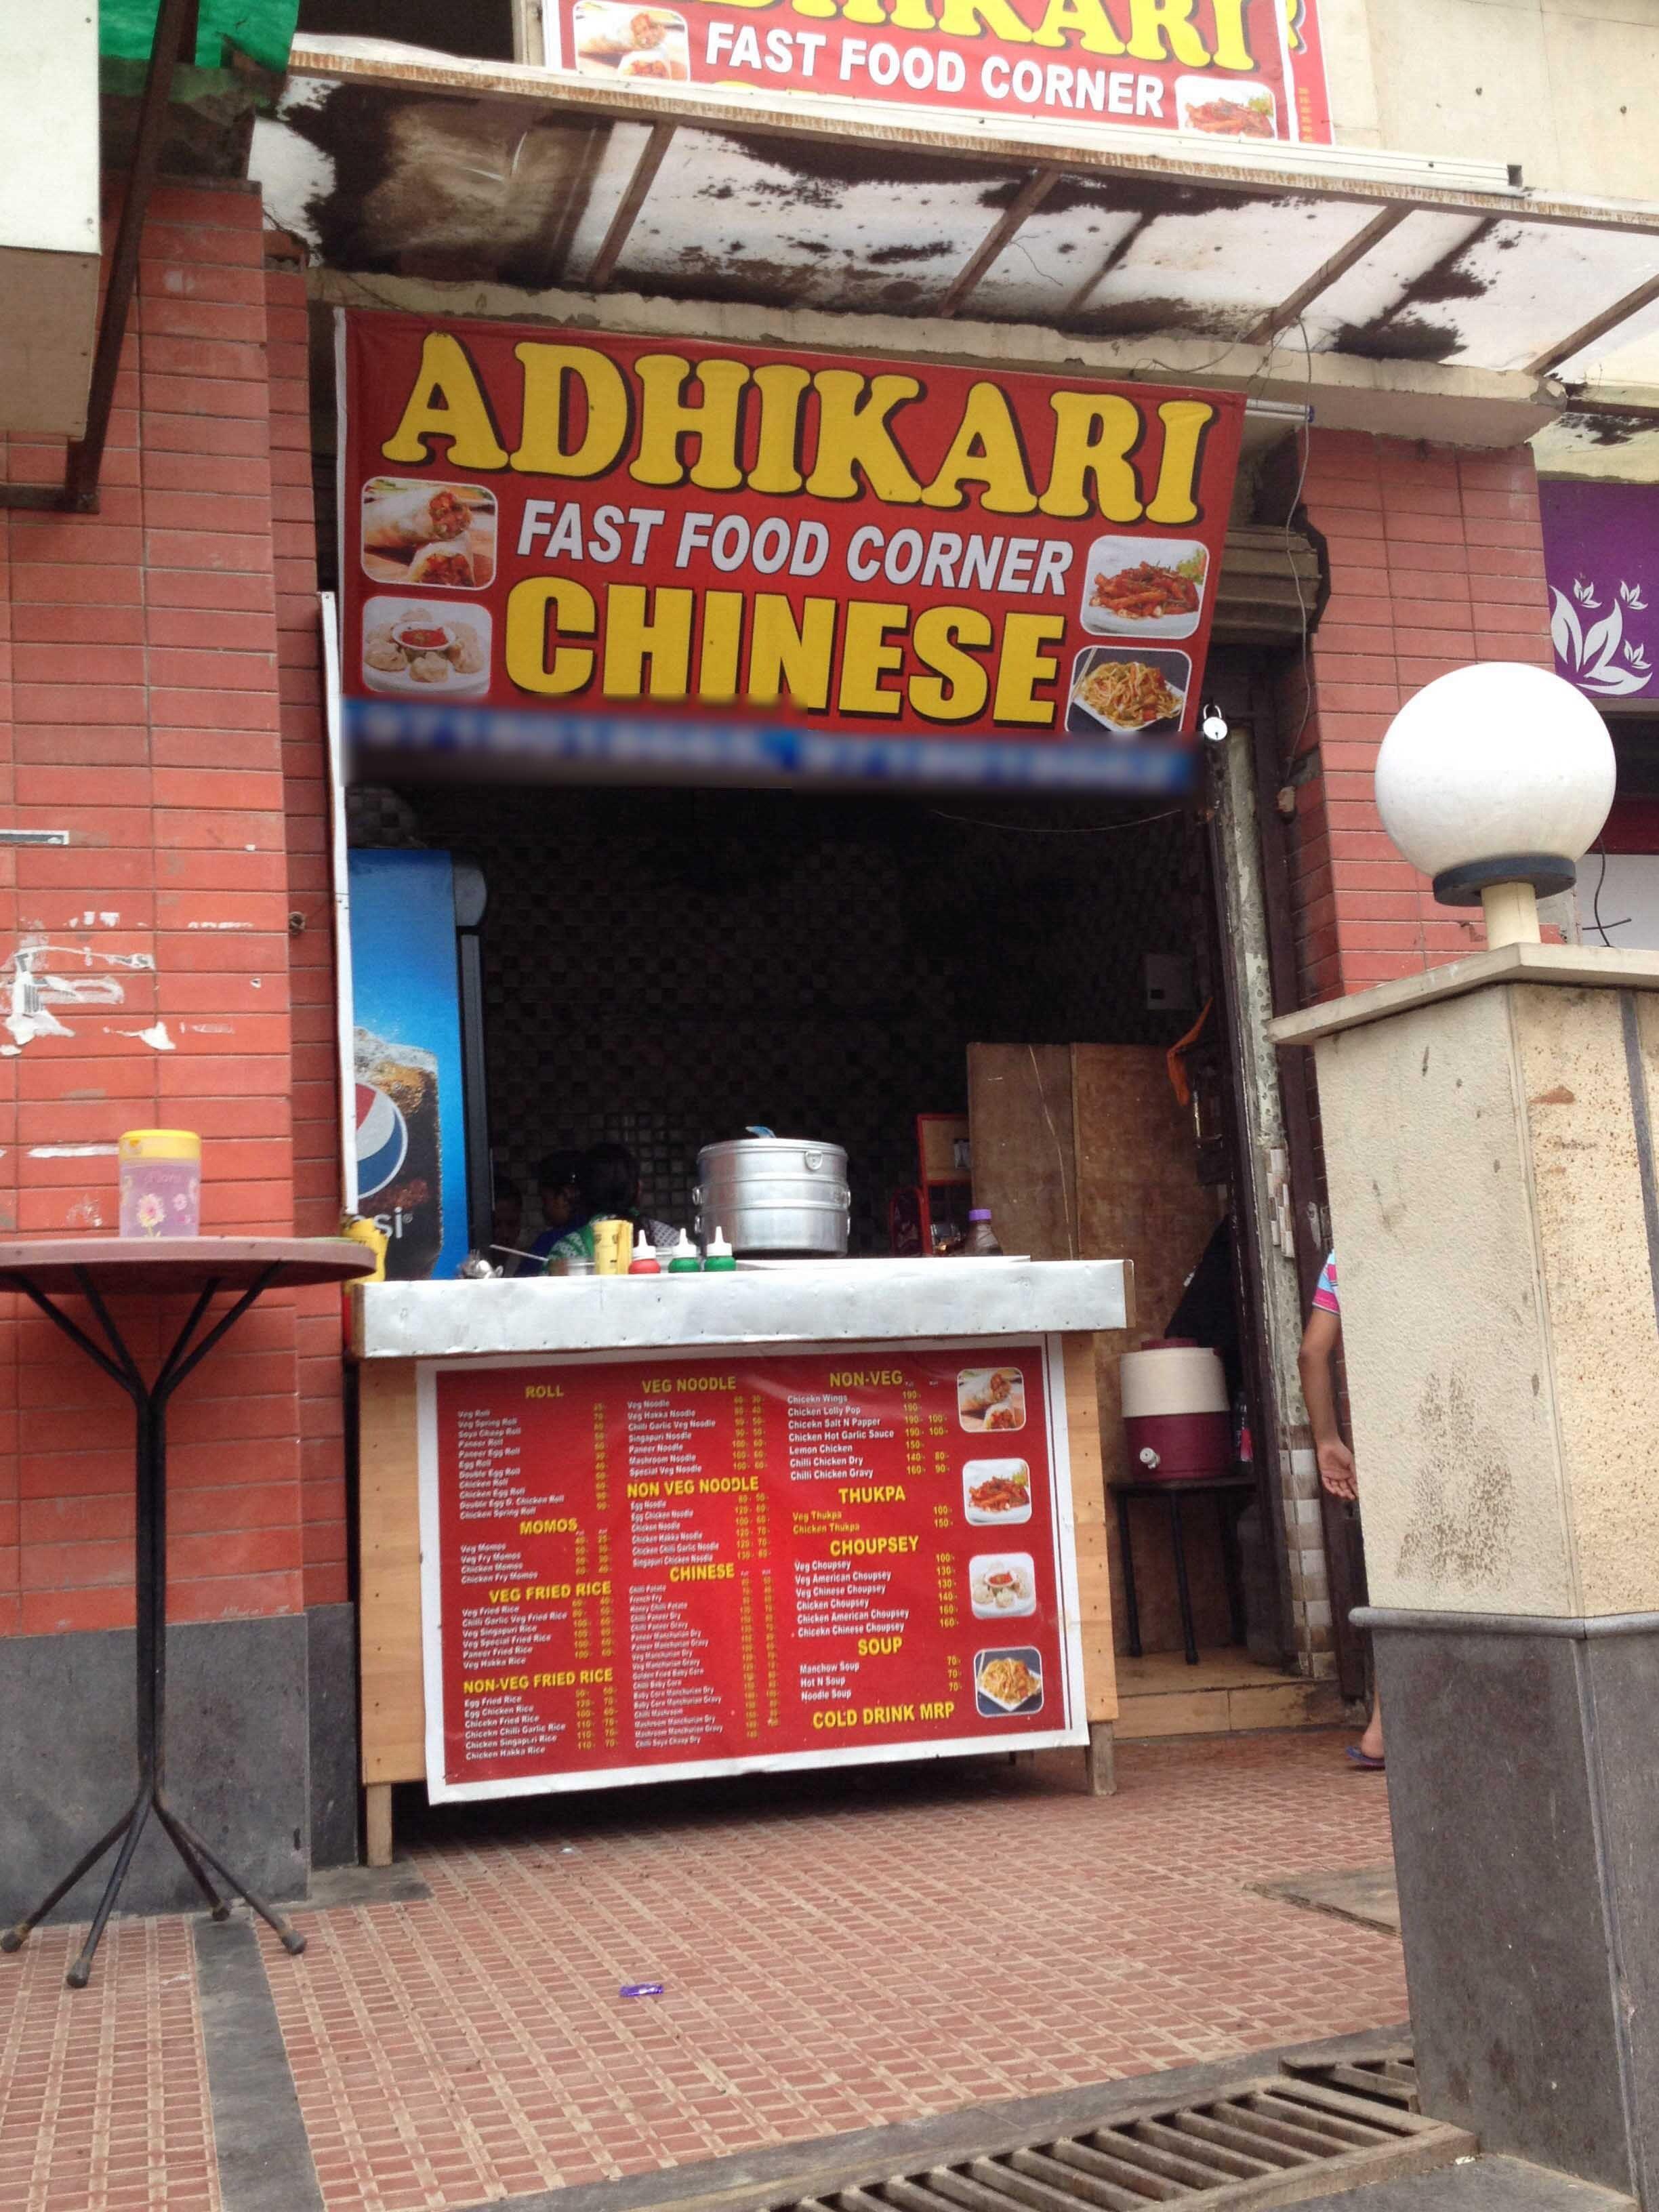 Adhikari Fast Food Corner - Sector 48 - Noida Image